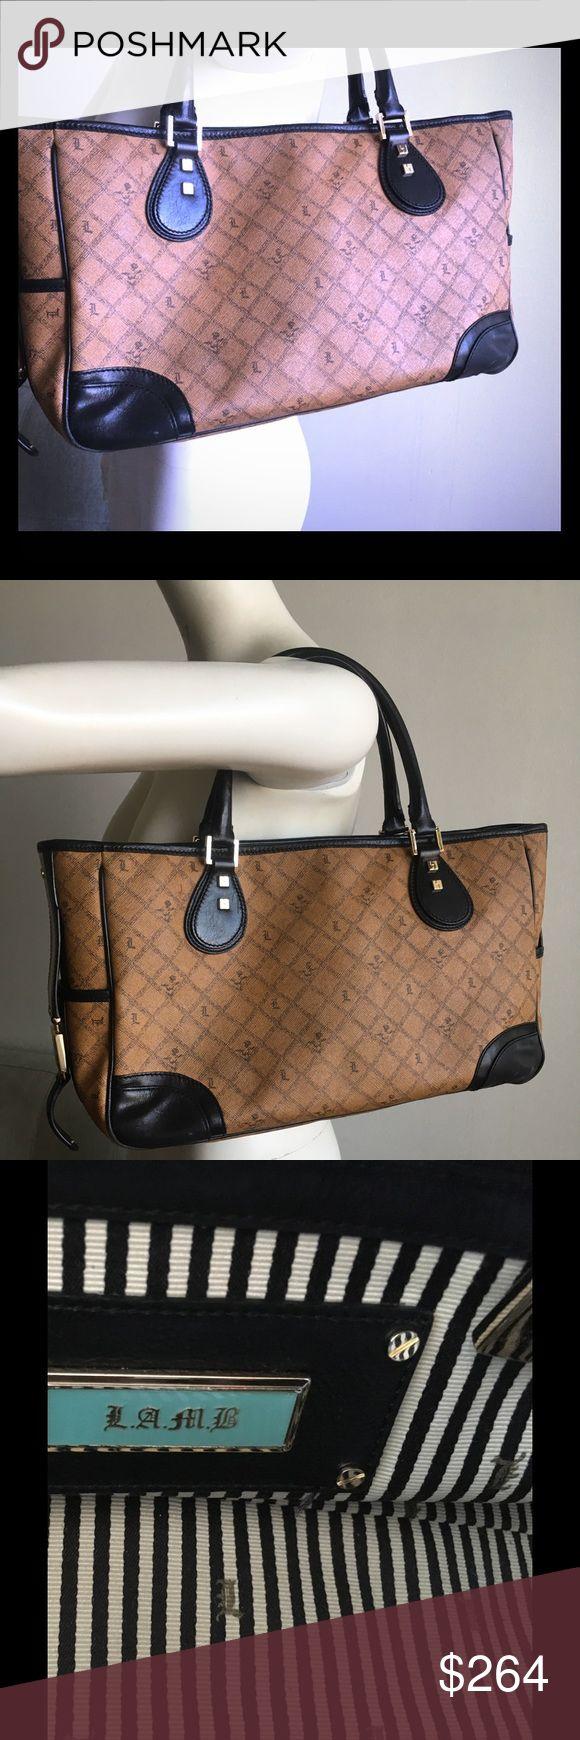 Lamb Handbag Beautiful handbag in mint condition  inside clean  100%authentic  lamb bag. Colors brown black and white  outside has signature stamp  L lamb Bags Satchels